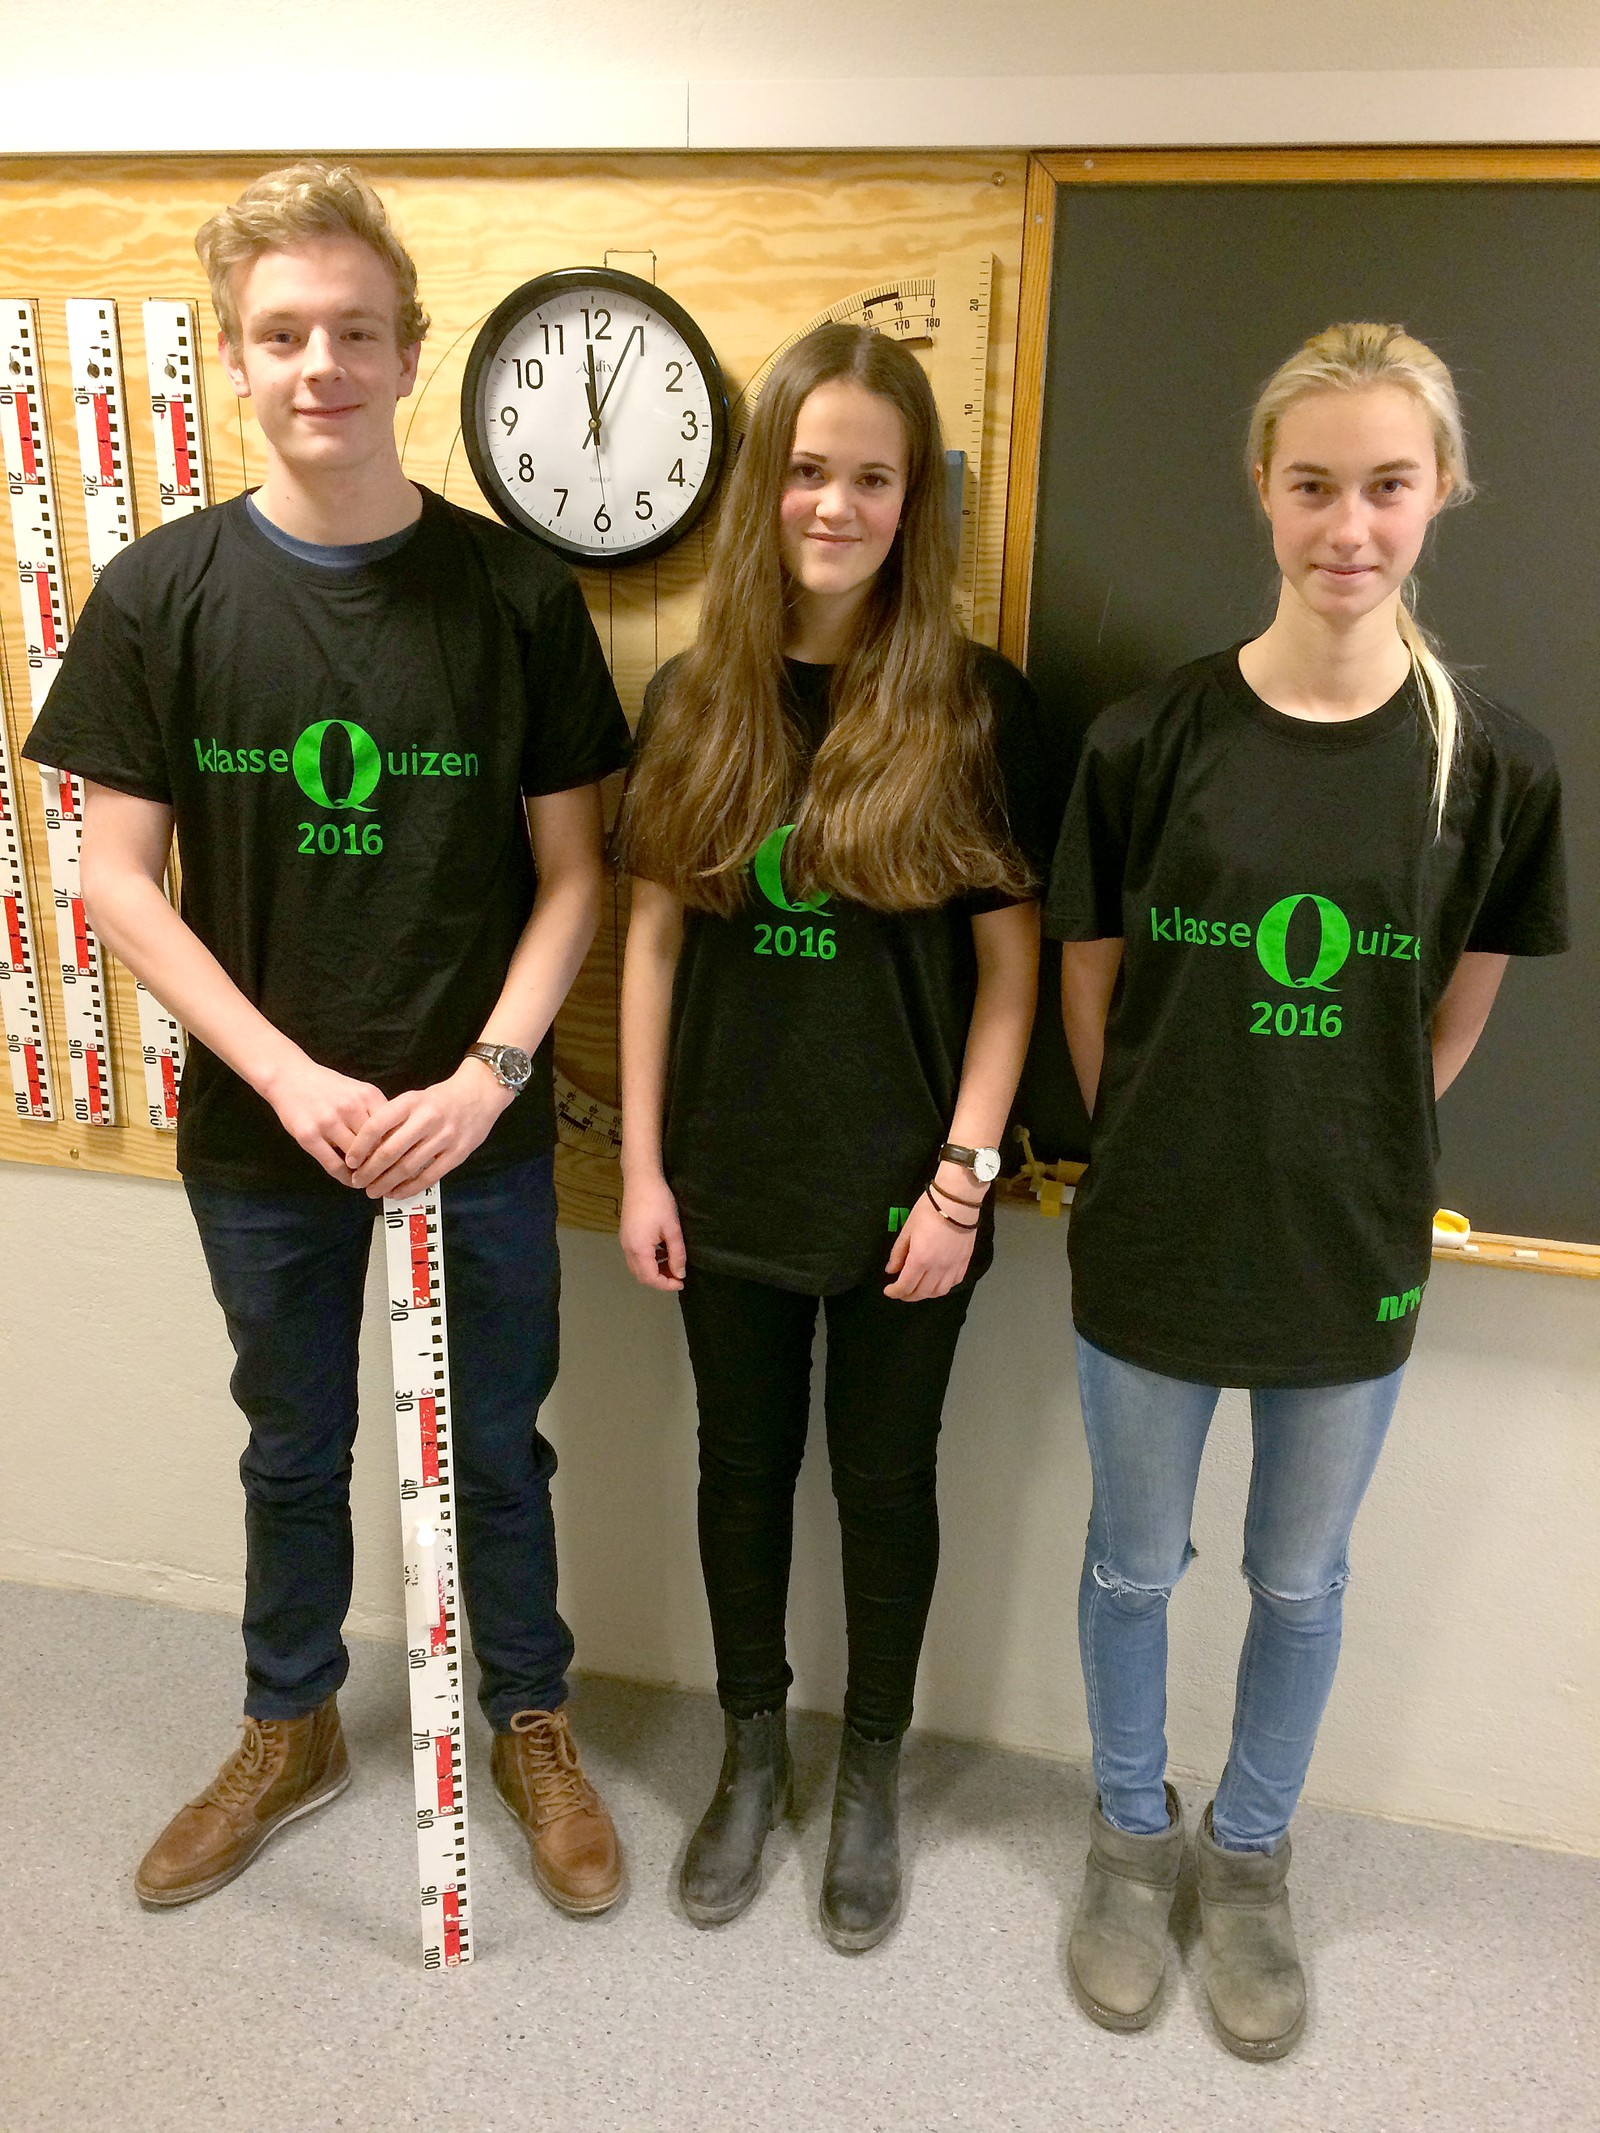 Anders Hjerkinn Helgetun, Anna Aune Bøe og Nora A. K. Sæther fra Oppdal ungdomsskole.